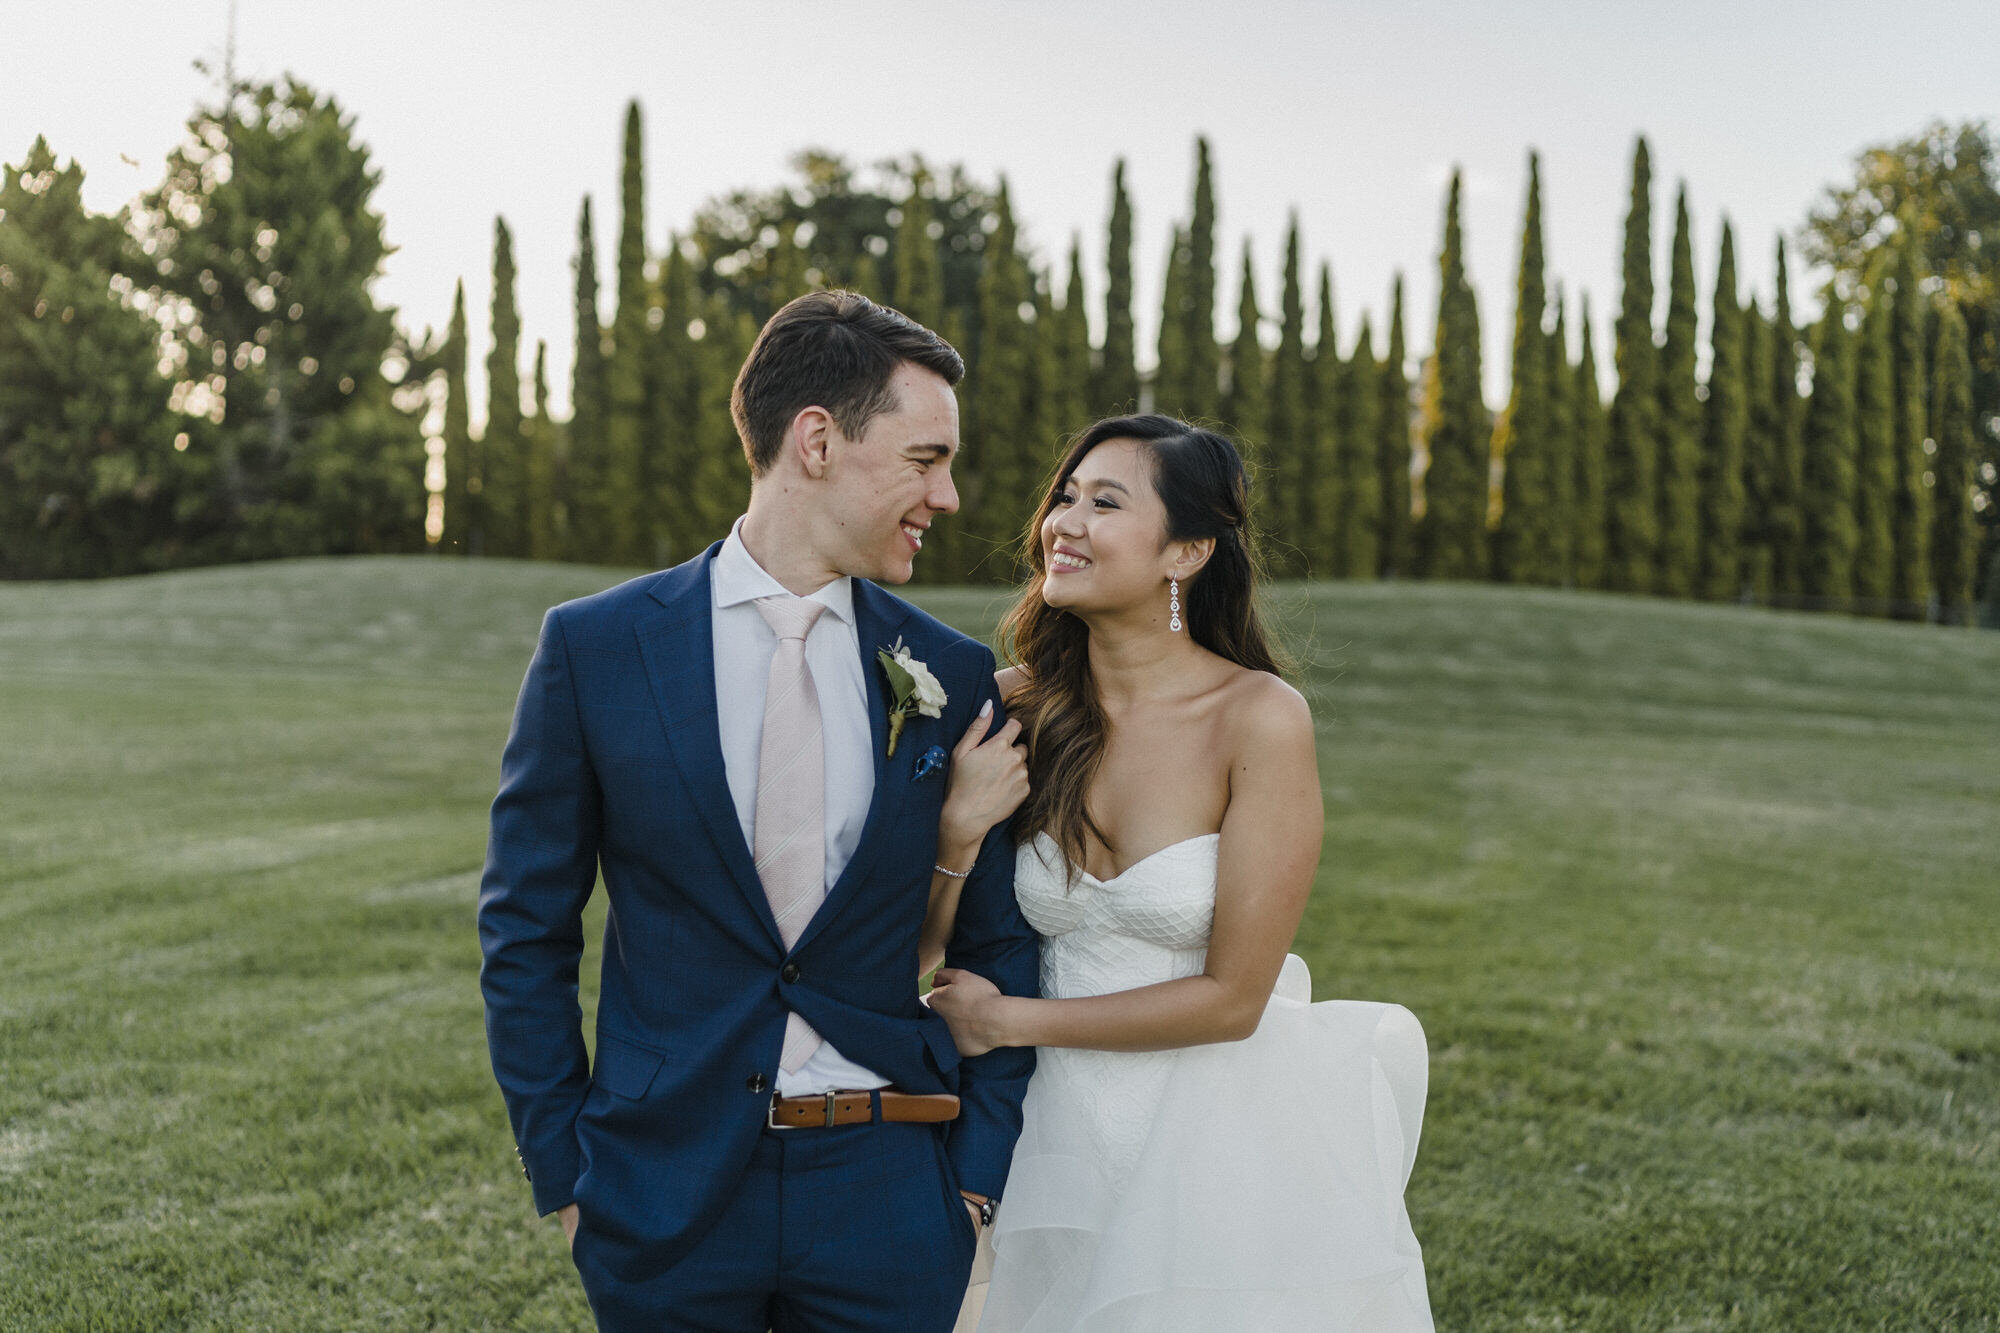 Corey Wright Stones Yarra Valley Wedding Photography_026.jpg